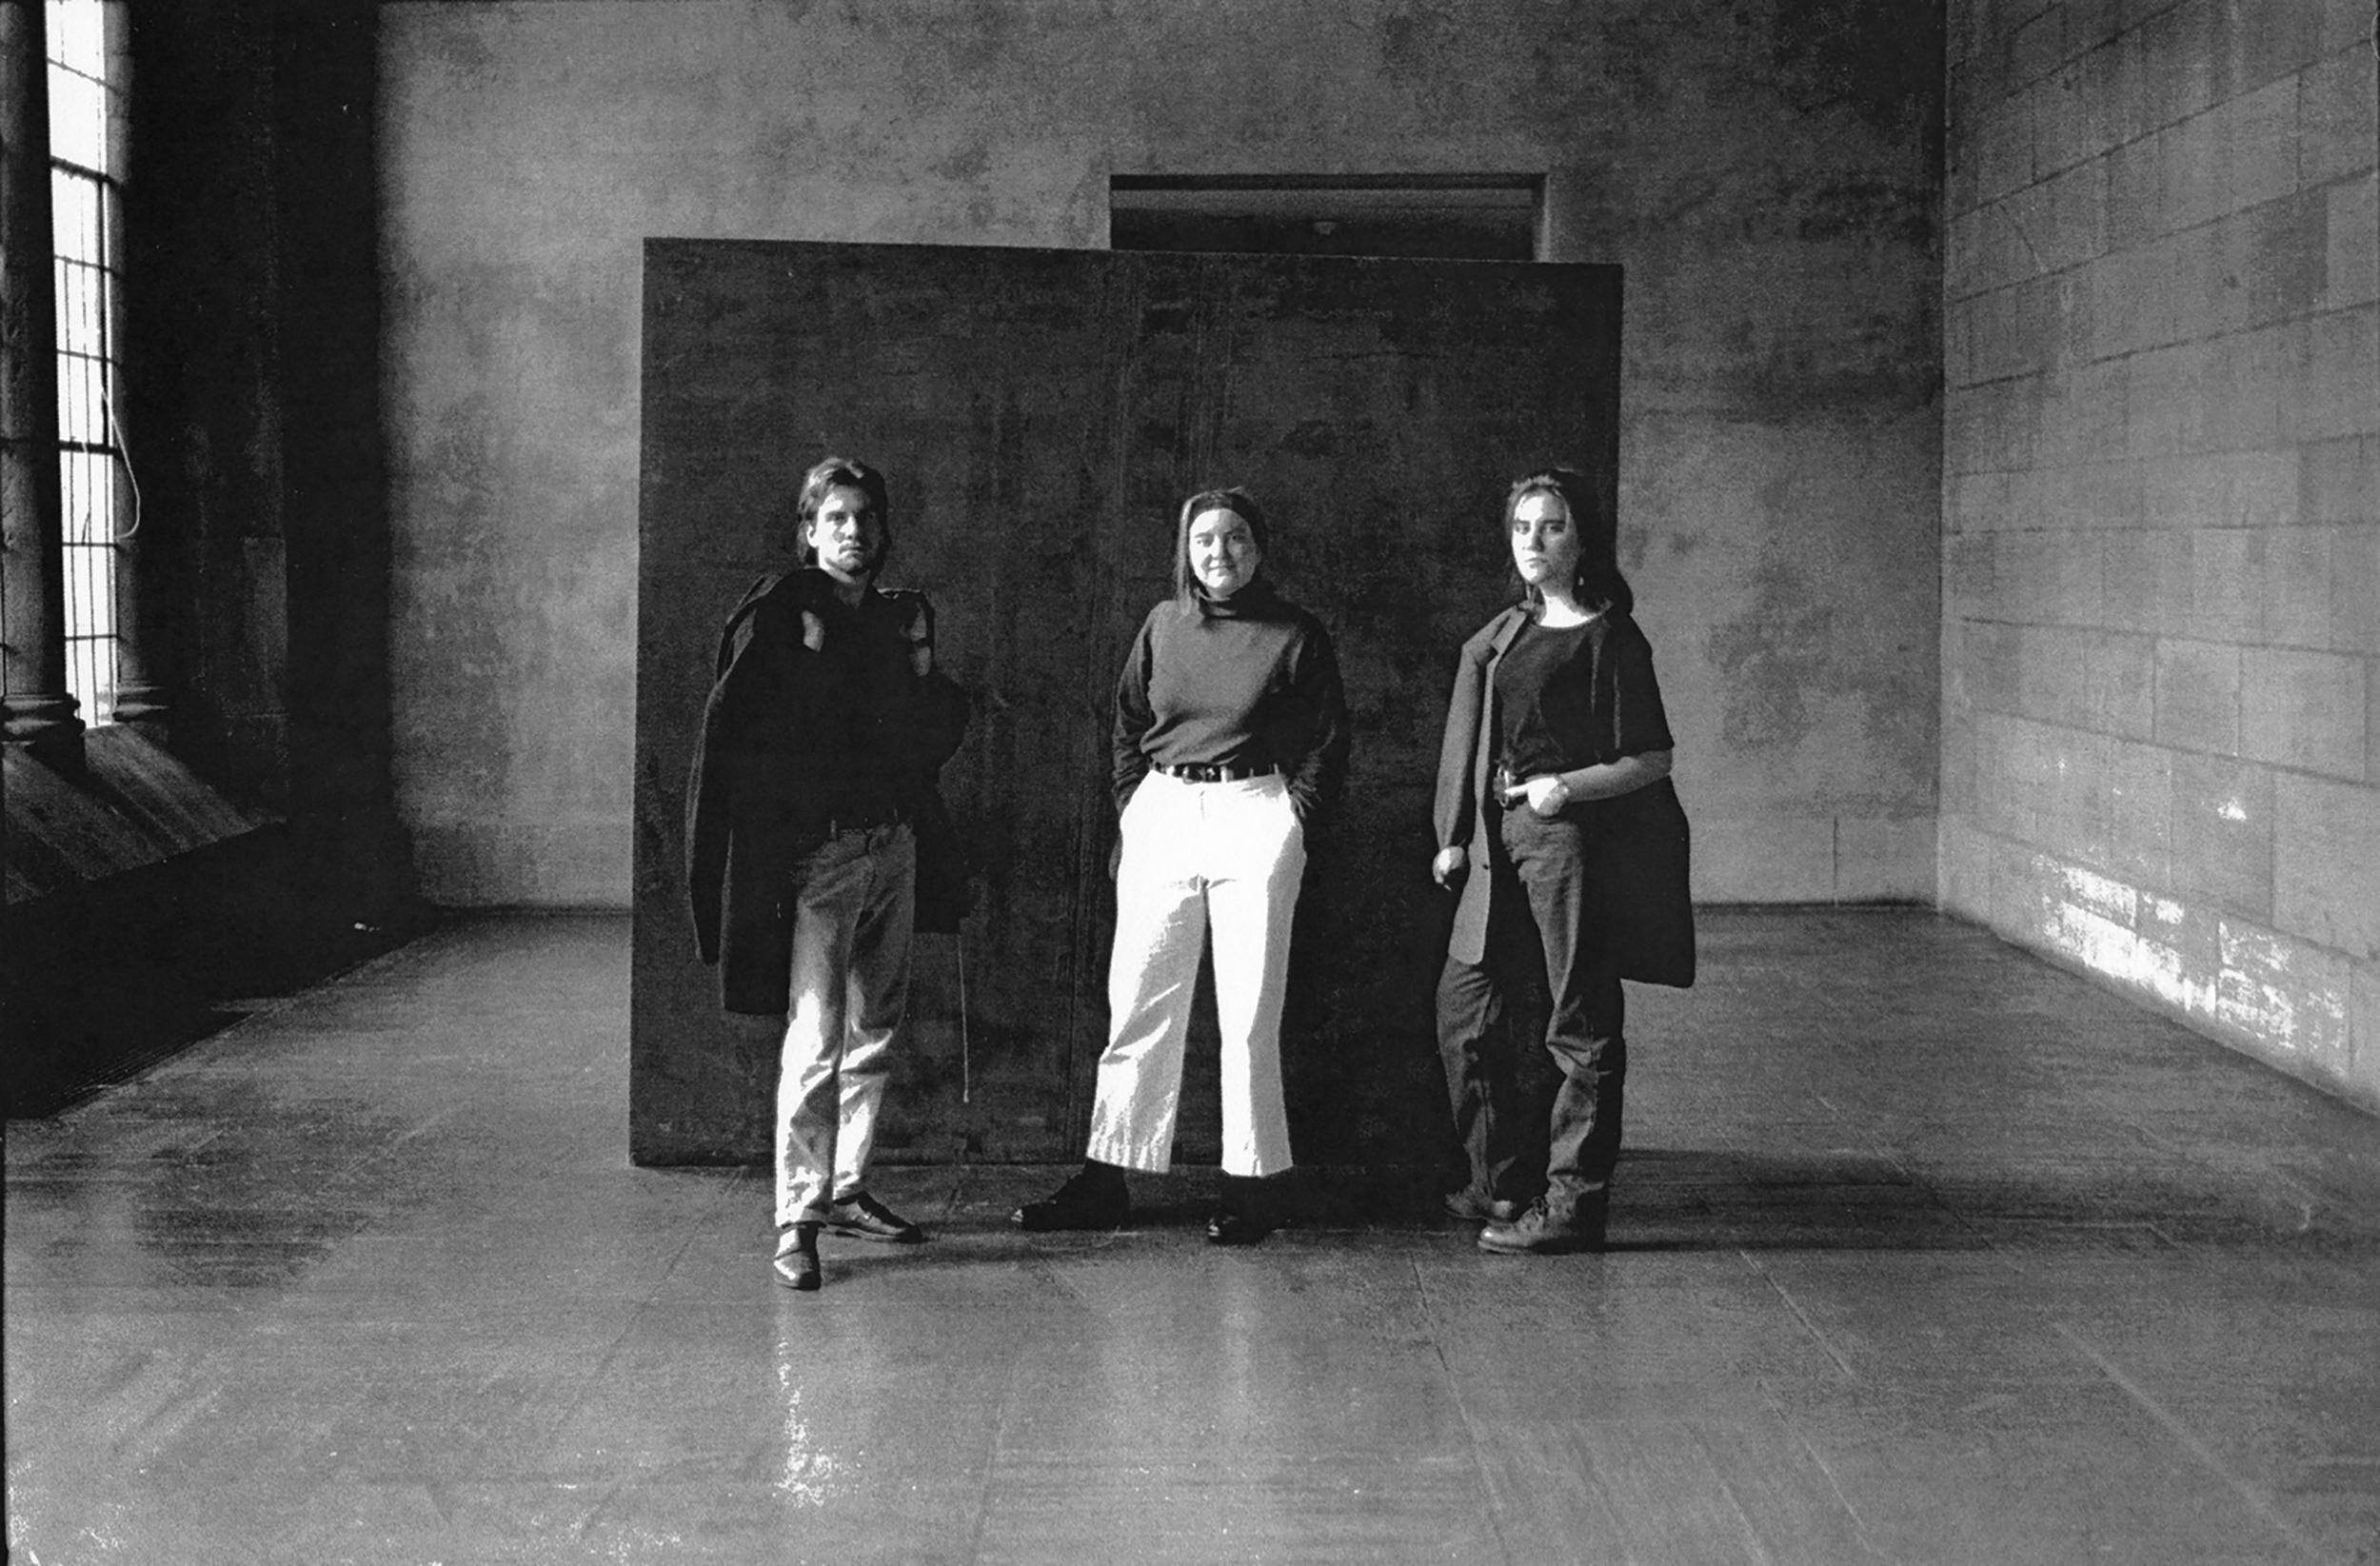 Aaron, Chryssa, and Shana in front of JU's Yale Art School classmate Richard Serra's sculpture, Yale University Art Gallery, New Haven, CT, c. fall 1987